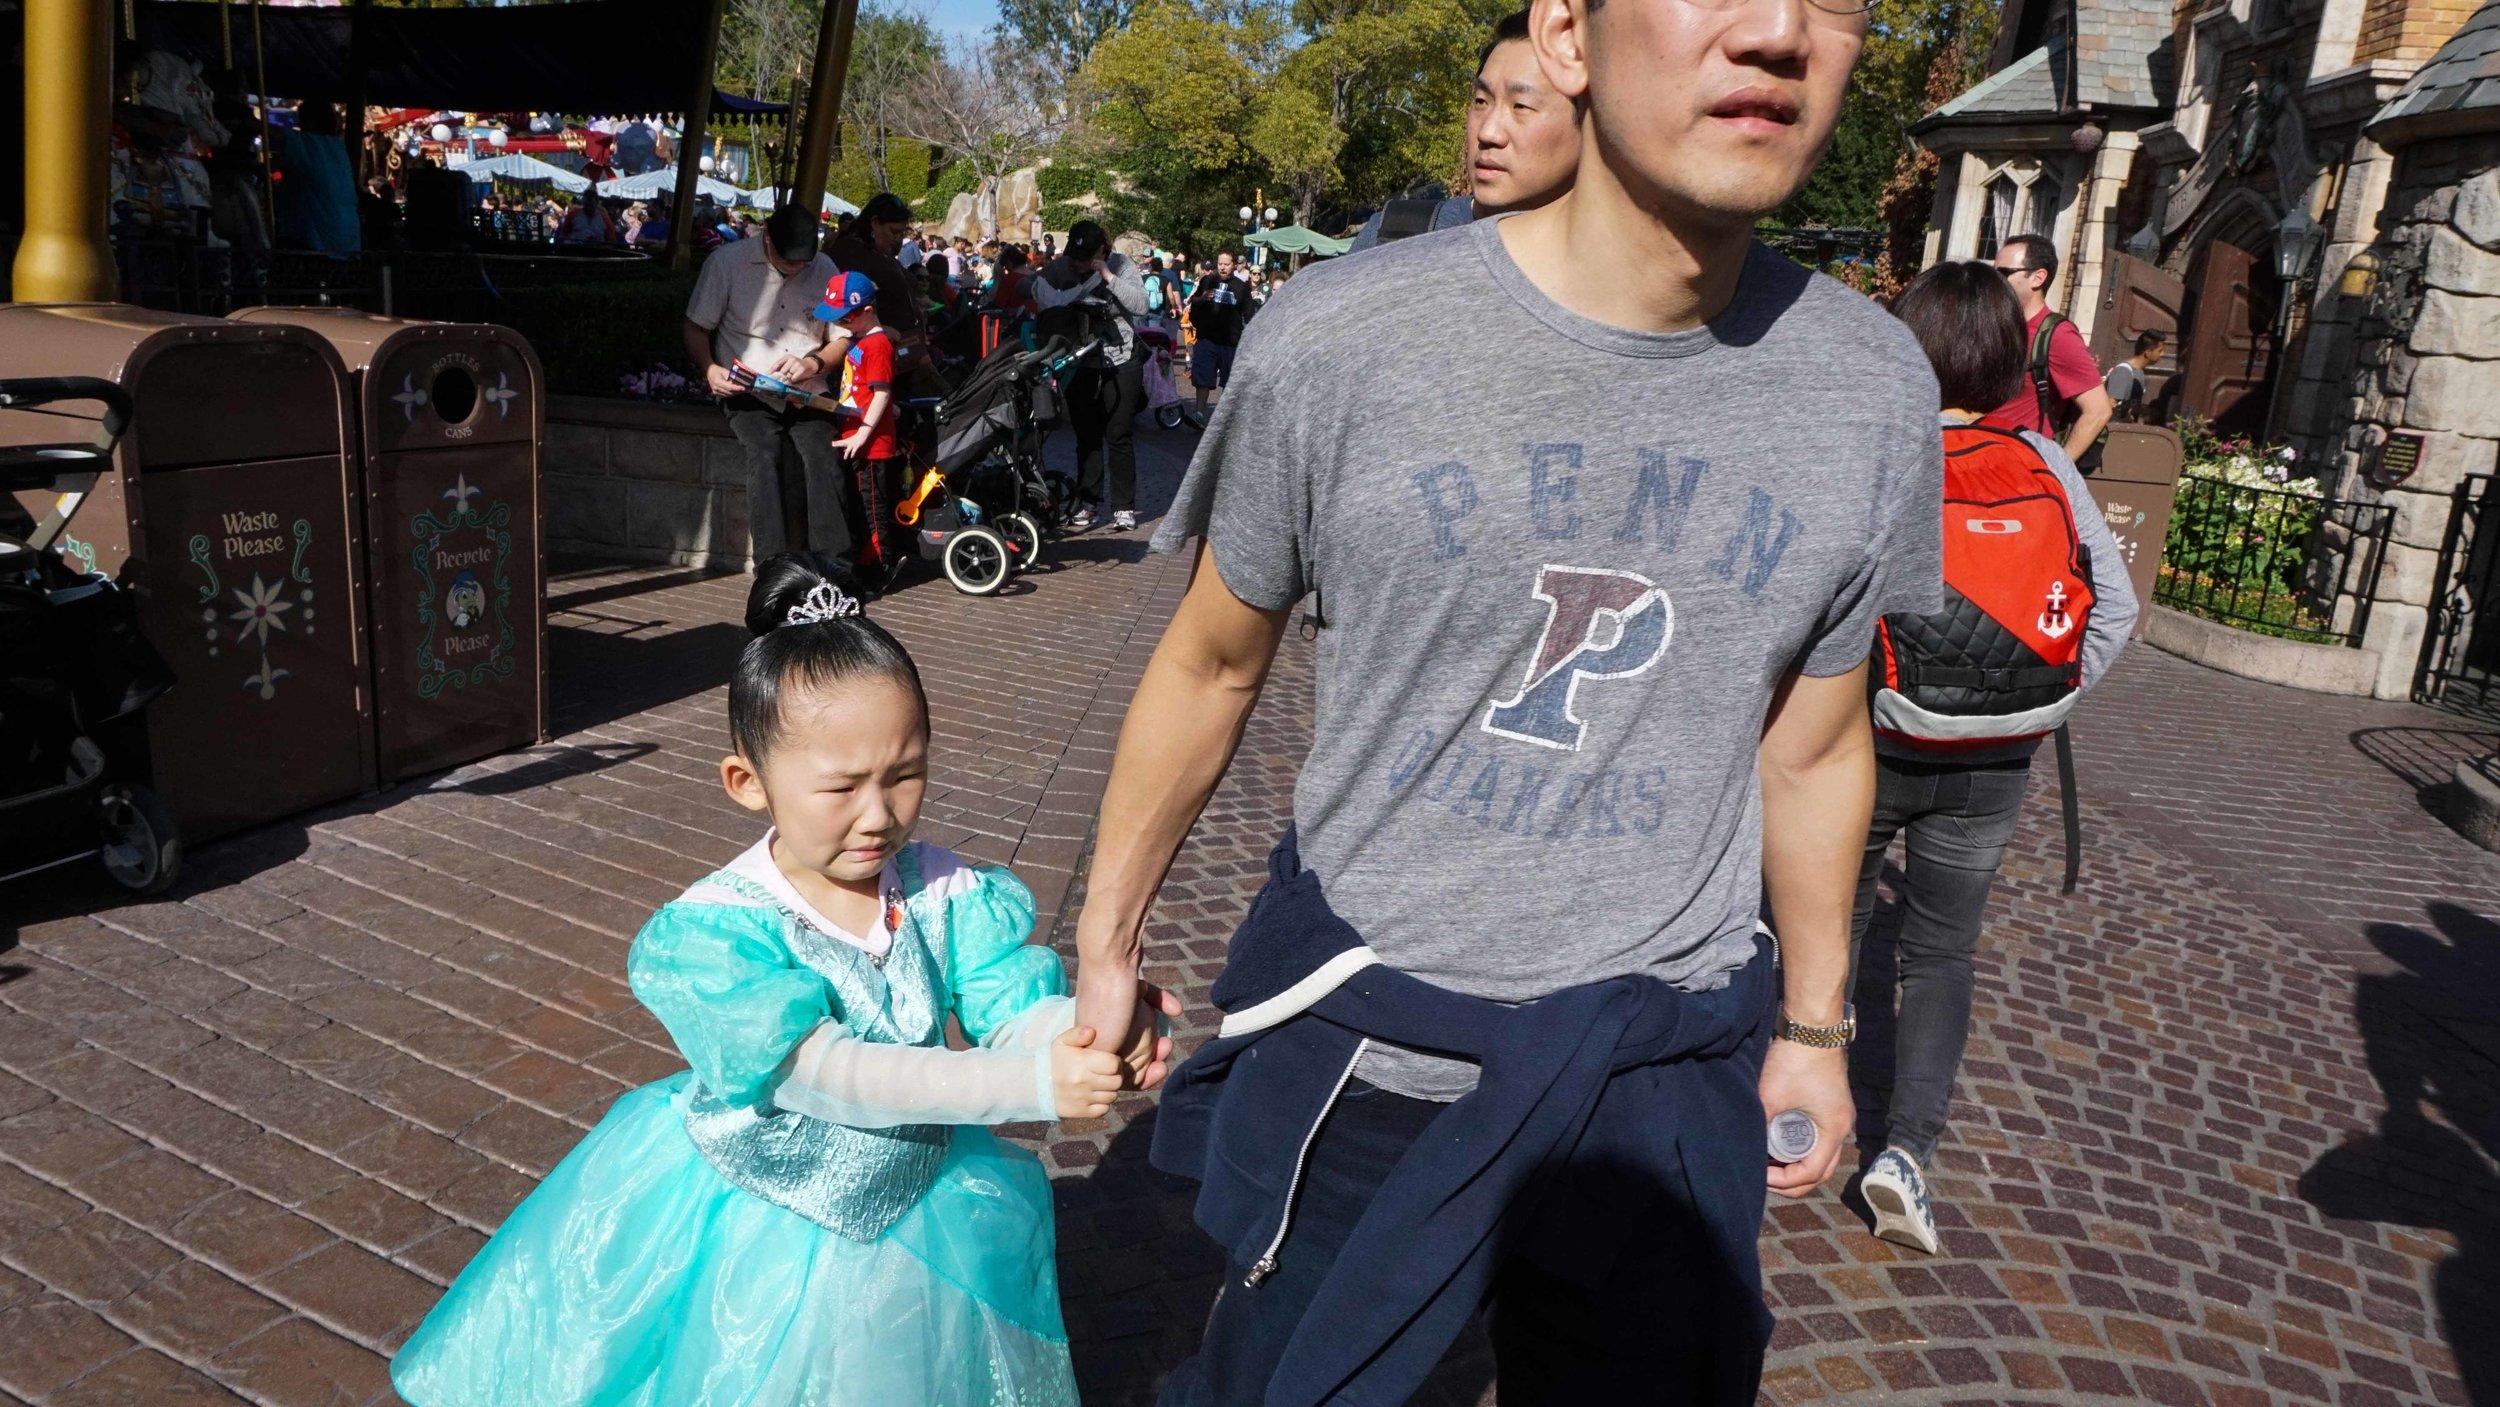 5-Disney-princess-crying-2-03526.jpg